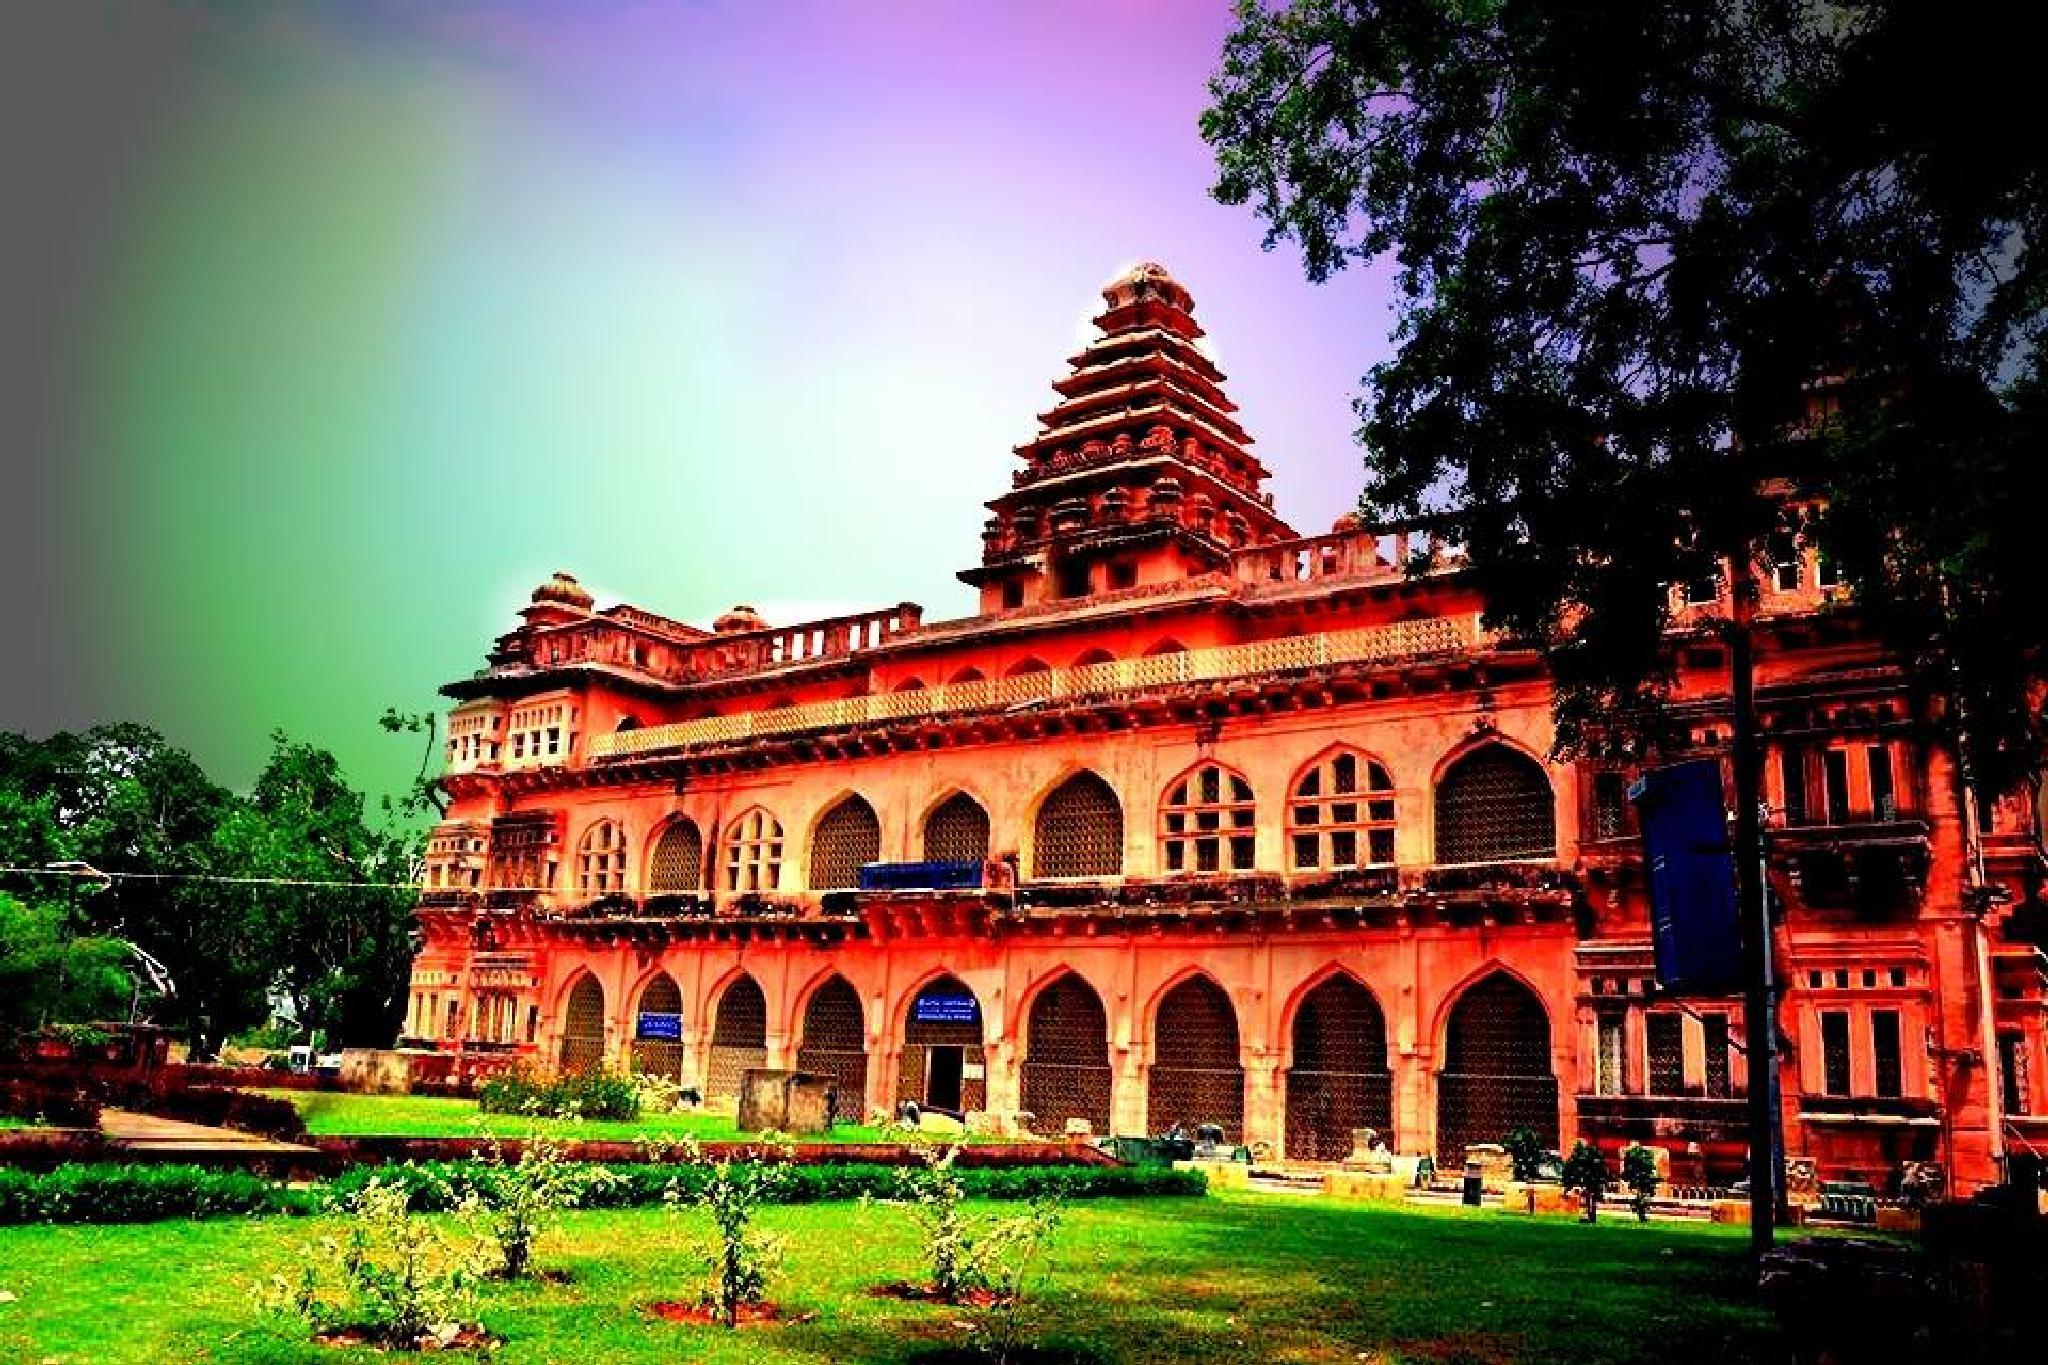 Chandragiri fort by E M Purandhar